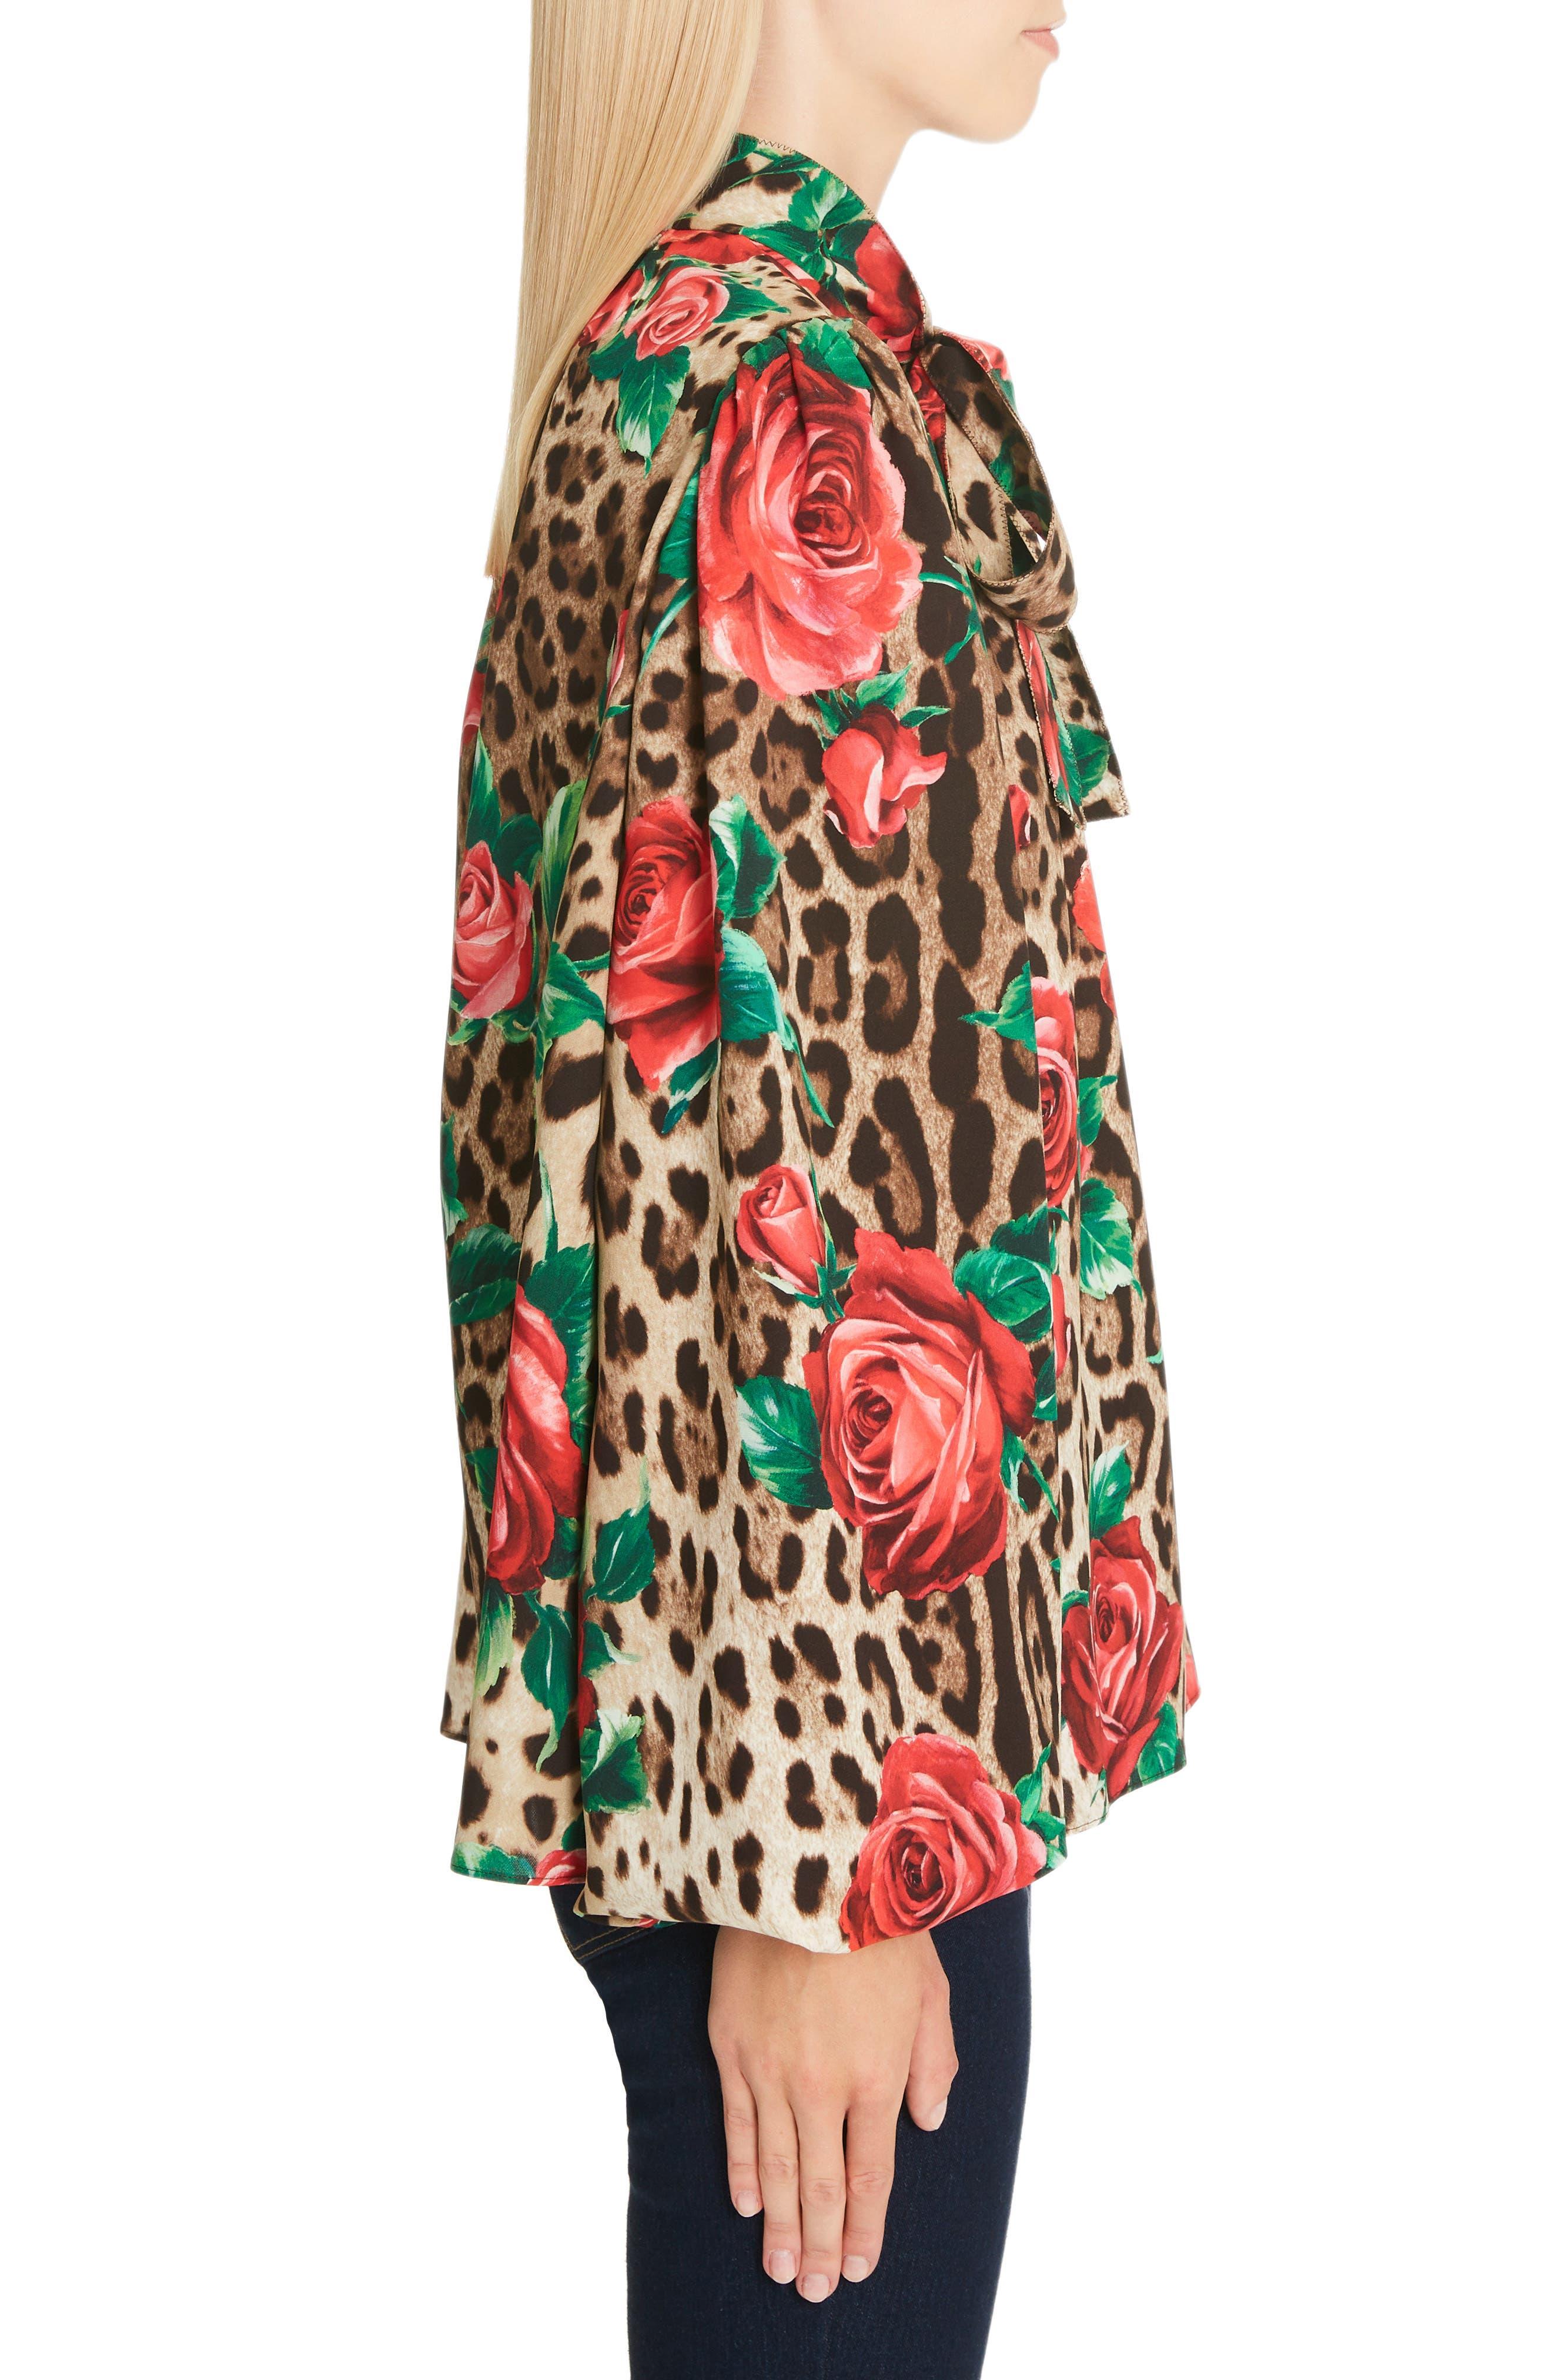 Rose & Leopard Print Tie Neck Stretch Silk Blouse,                             Alternate thumbnail 3, color,                             HKIRS ROSE LEO